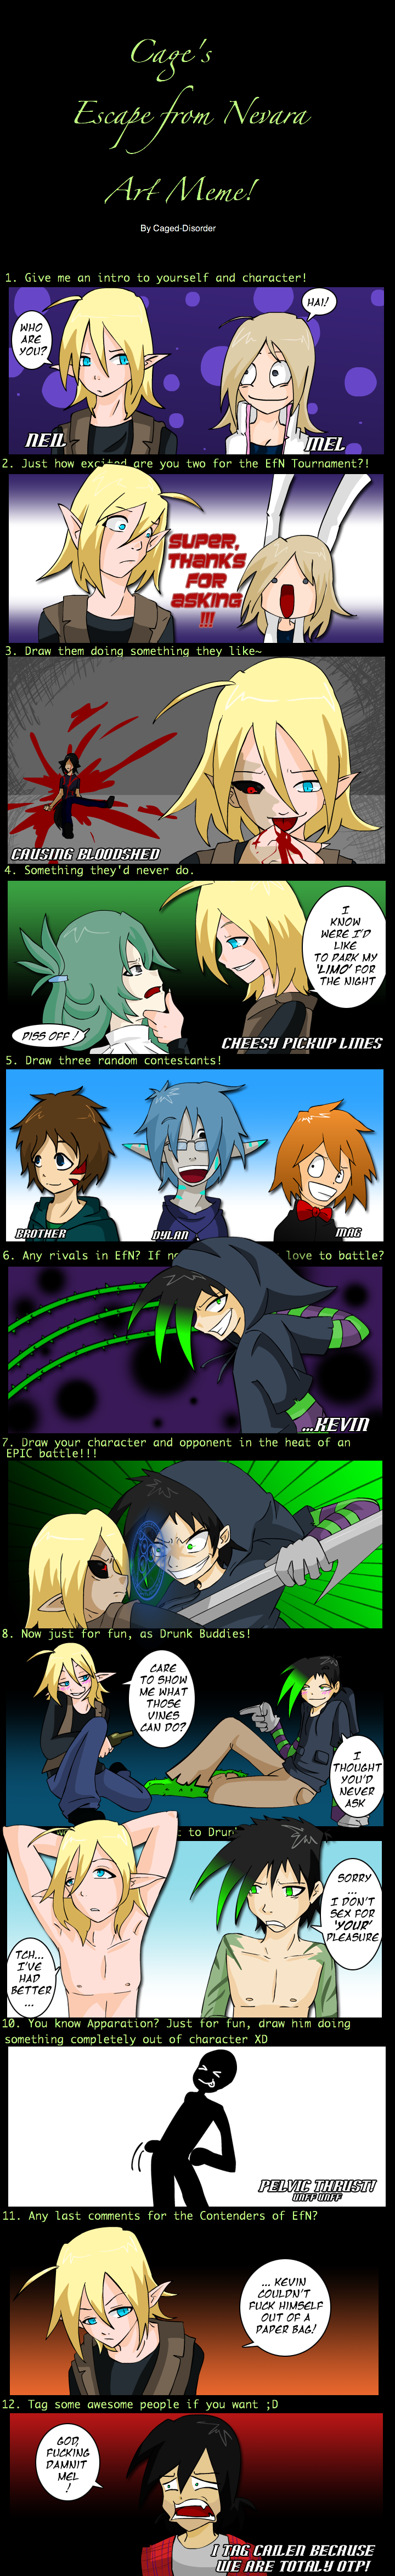 EFN Meme by kaitoiscool